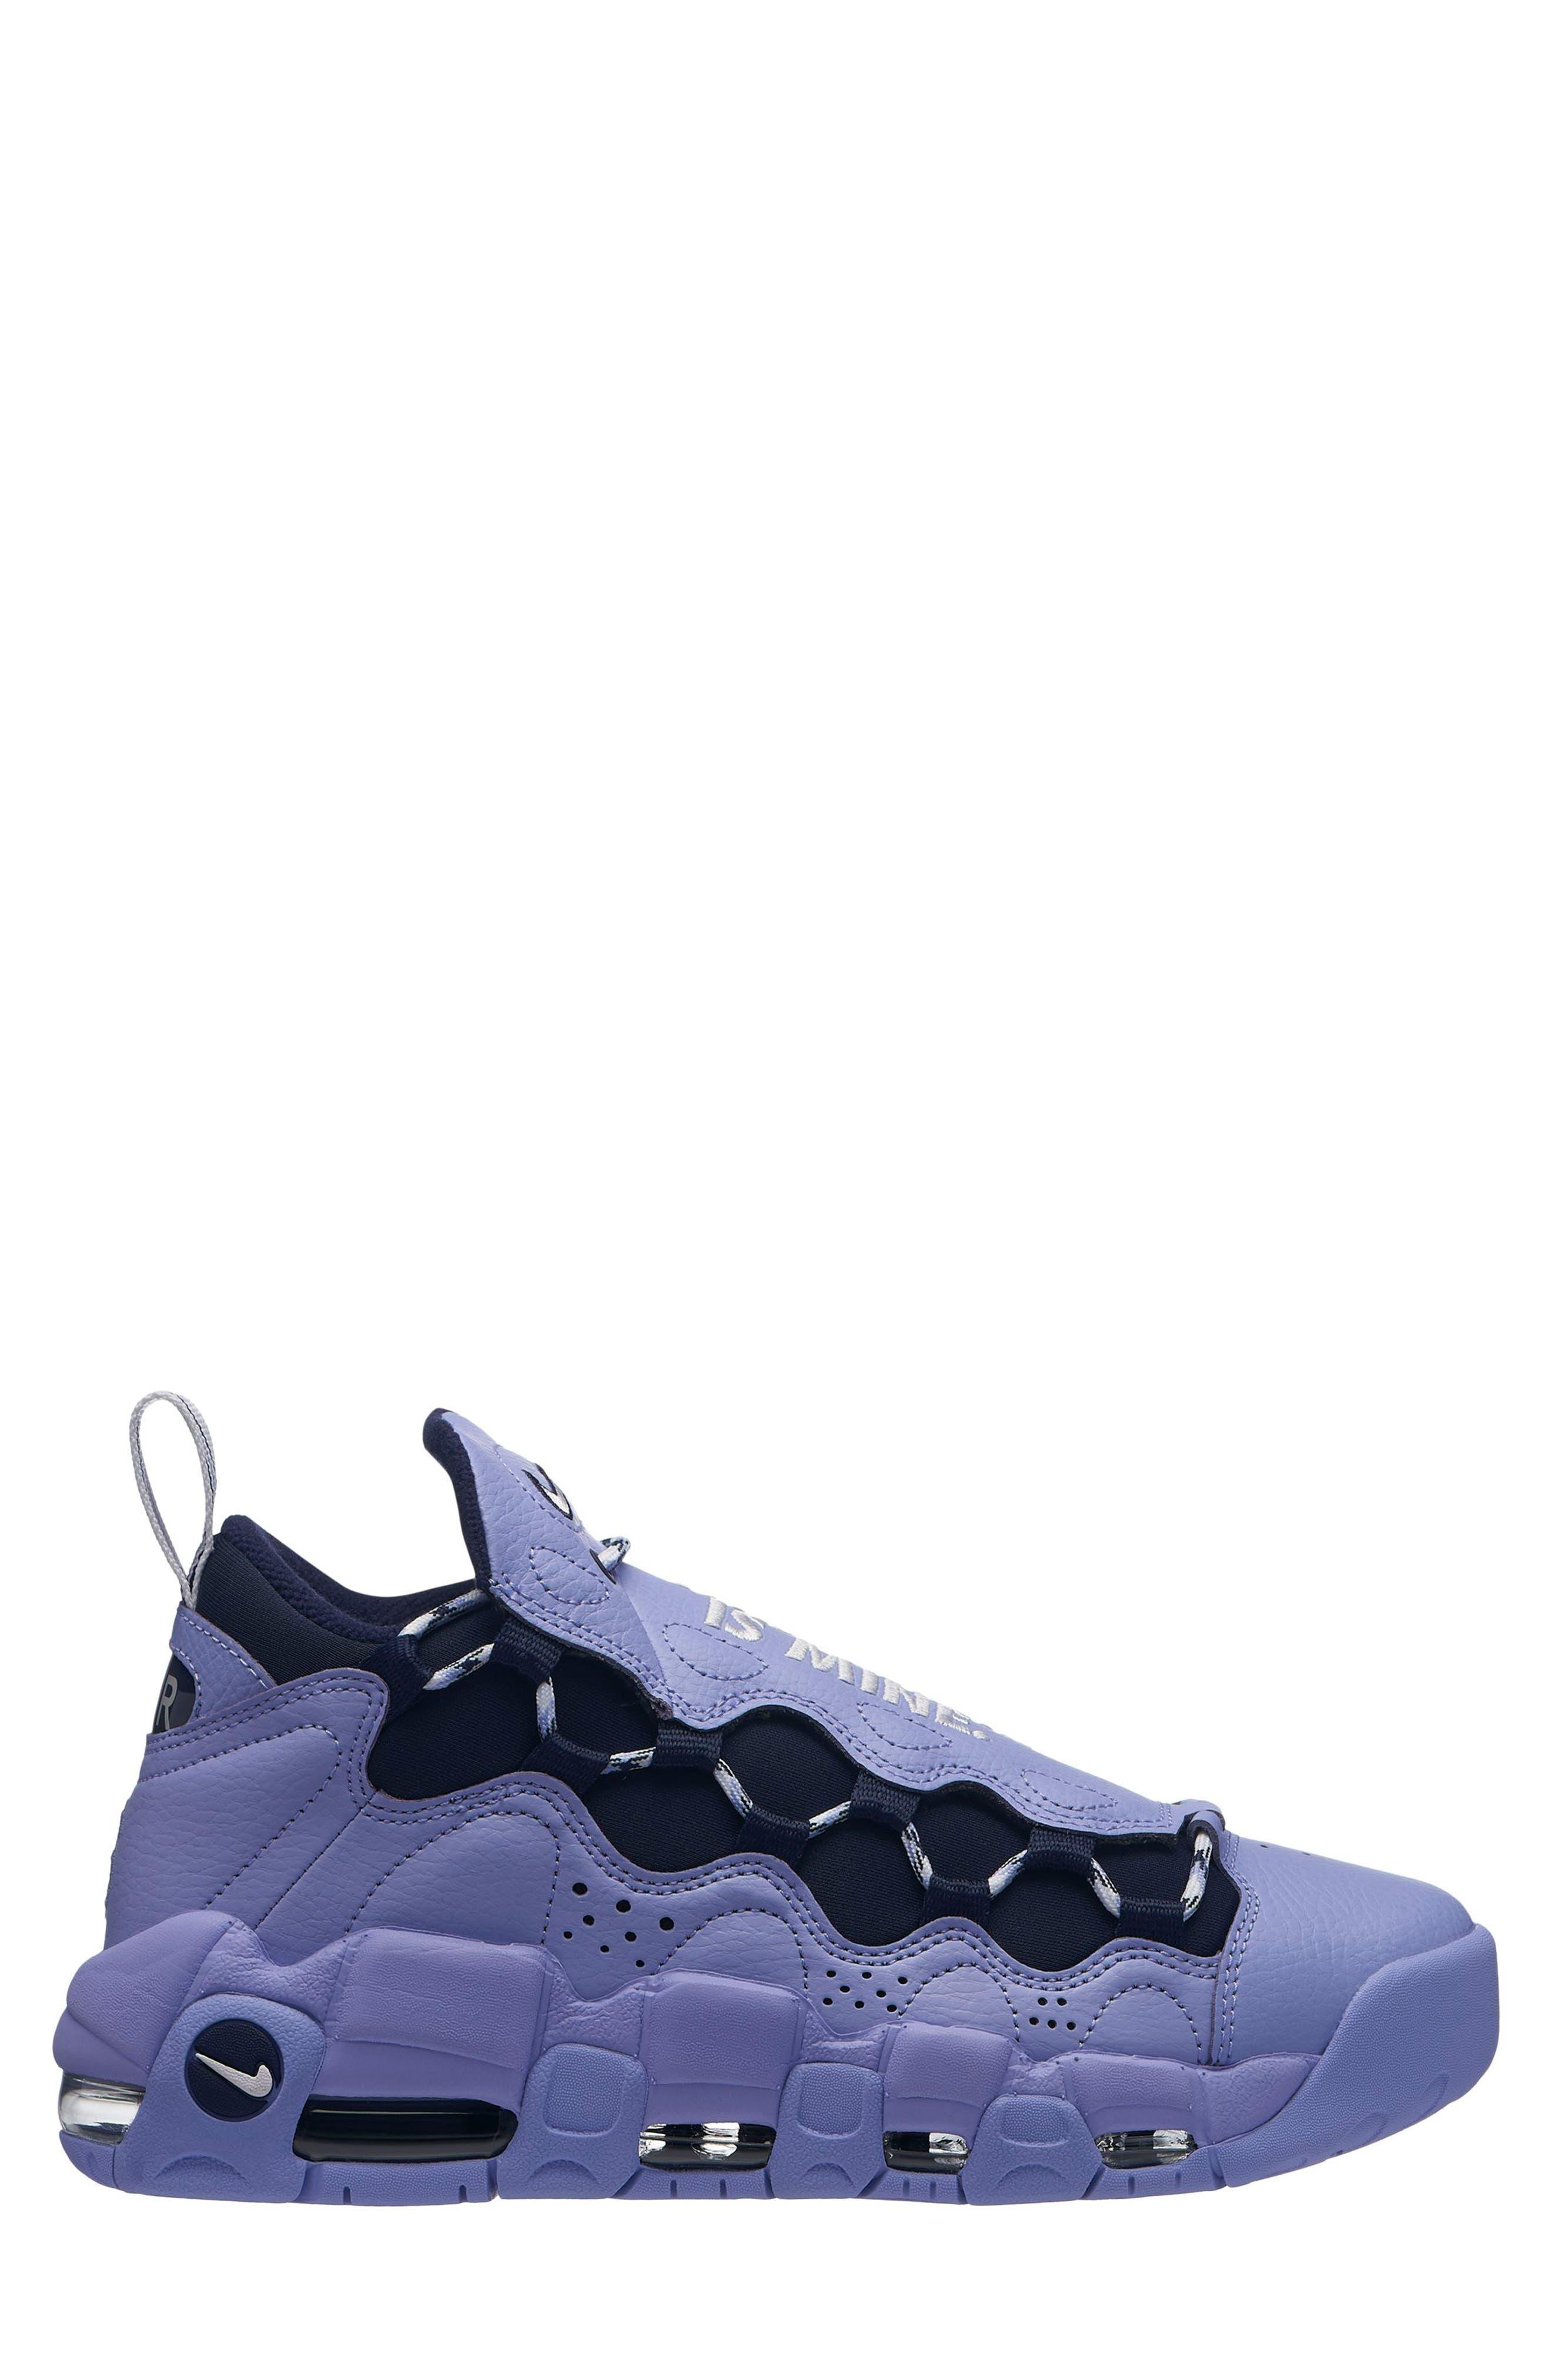 Nike Air More Money Sneaker (Women